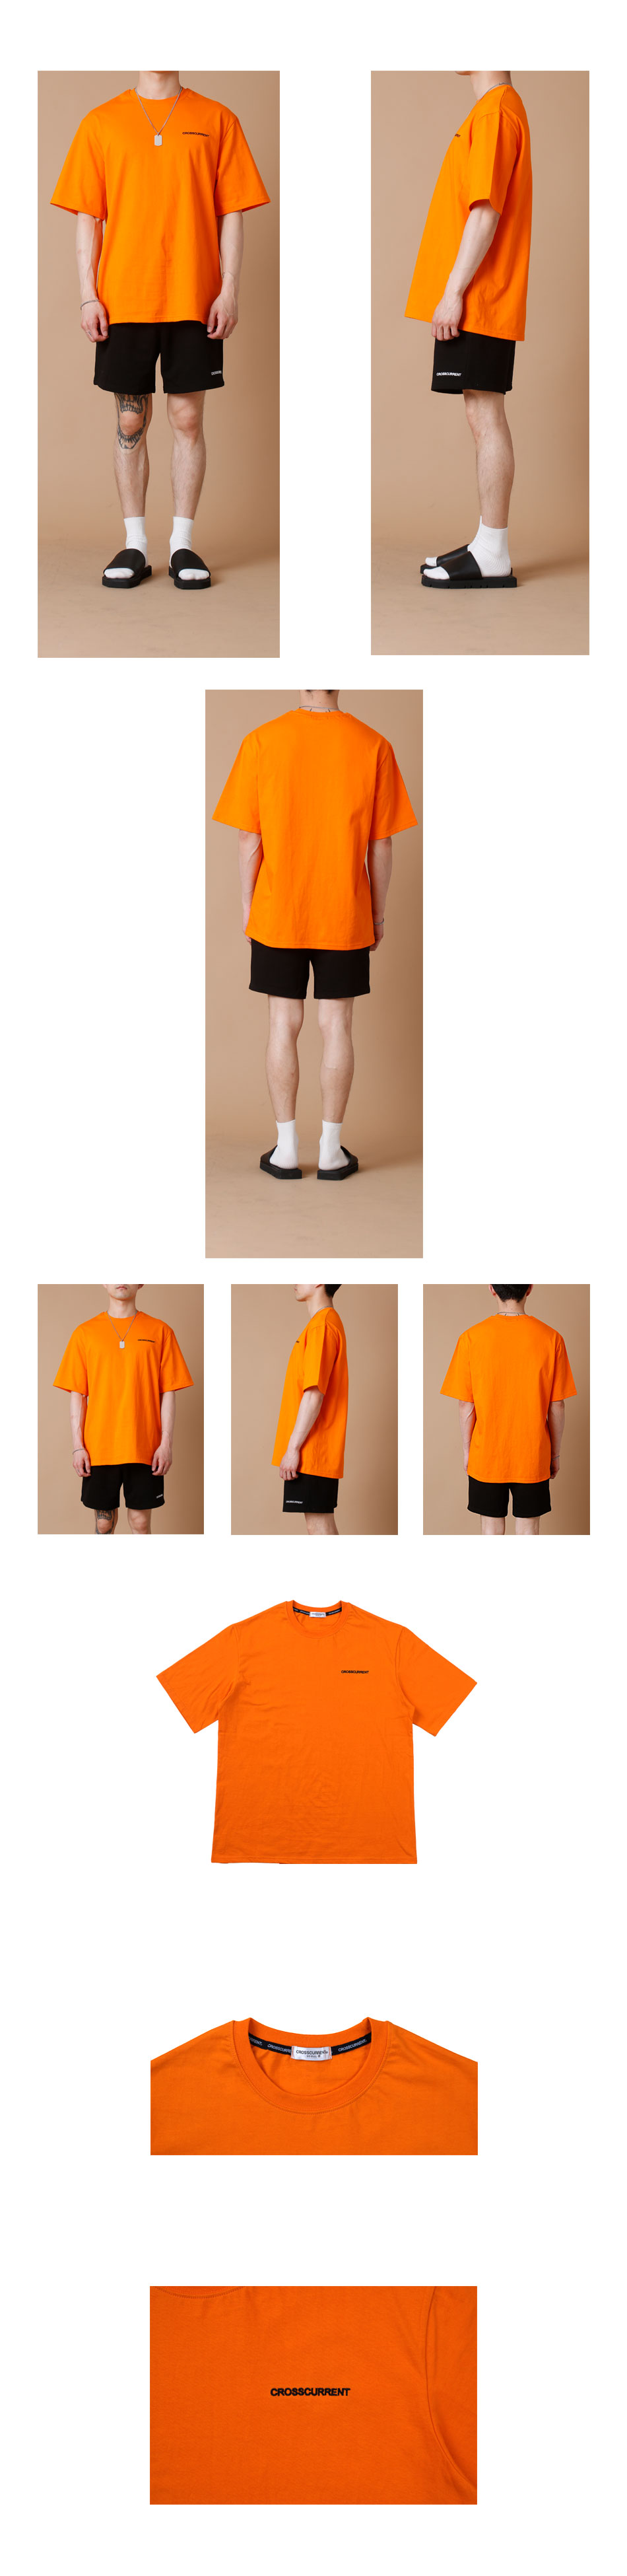 #crct00002-CCT-Small-Logo-Short-Sleeve-오렌지950.jpg